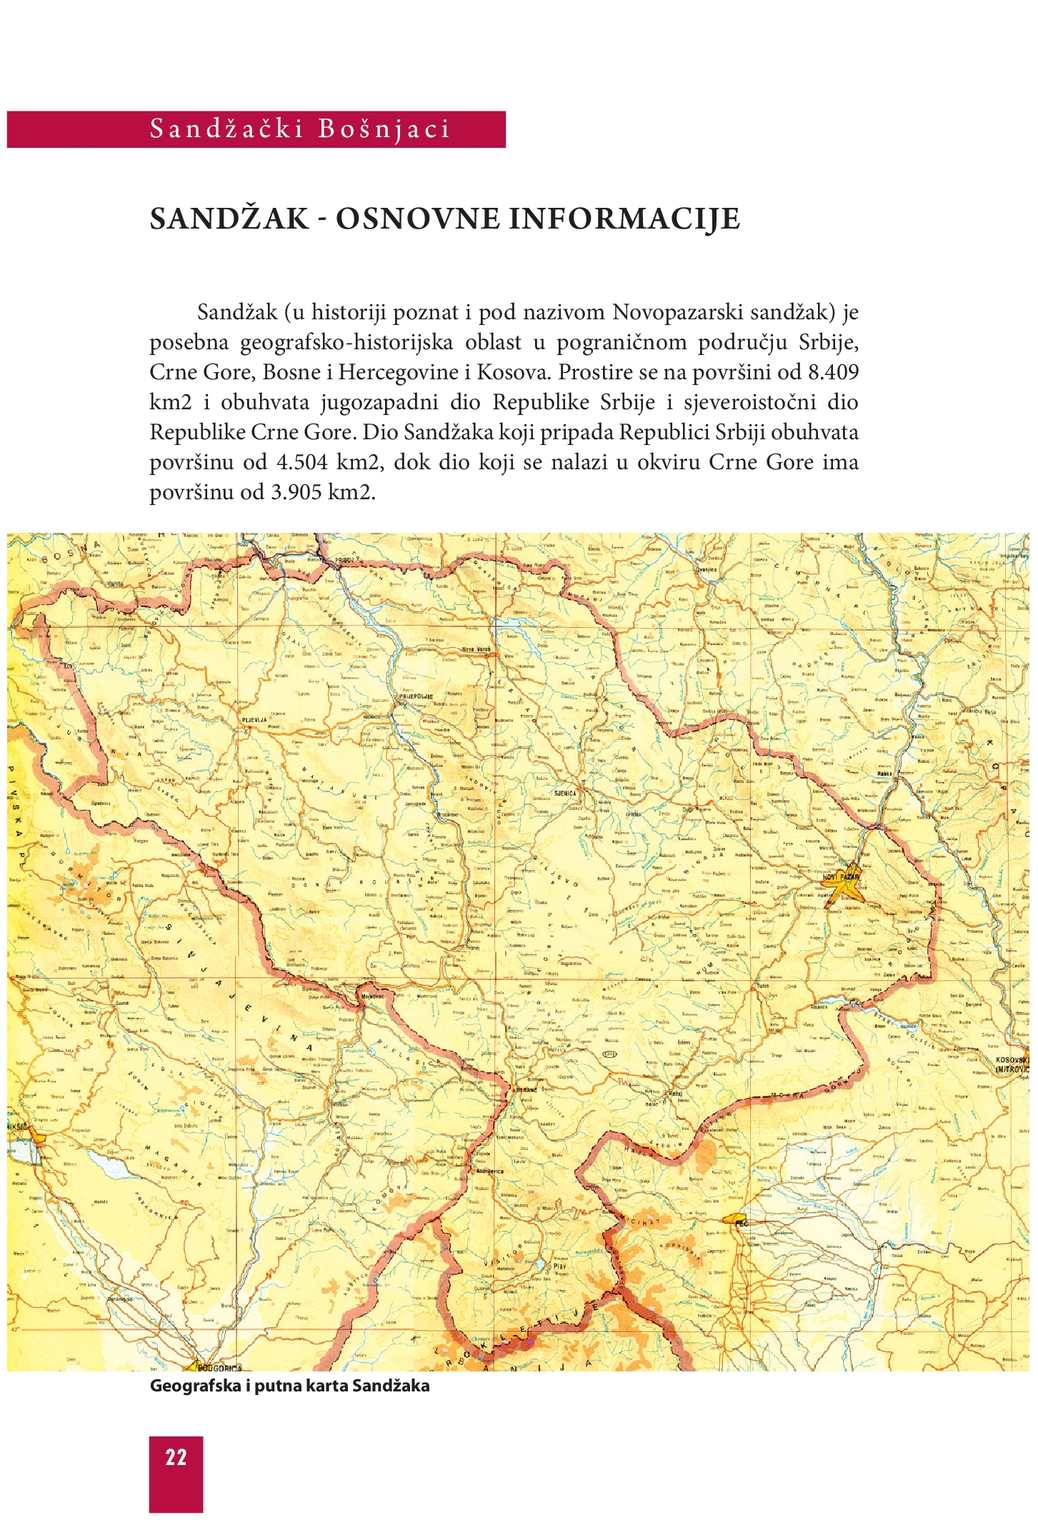 Sandzacki Bosnjaci Calameo Downloader